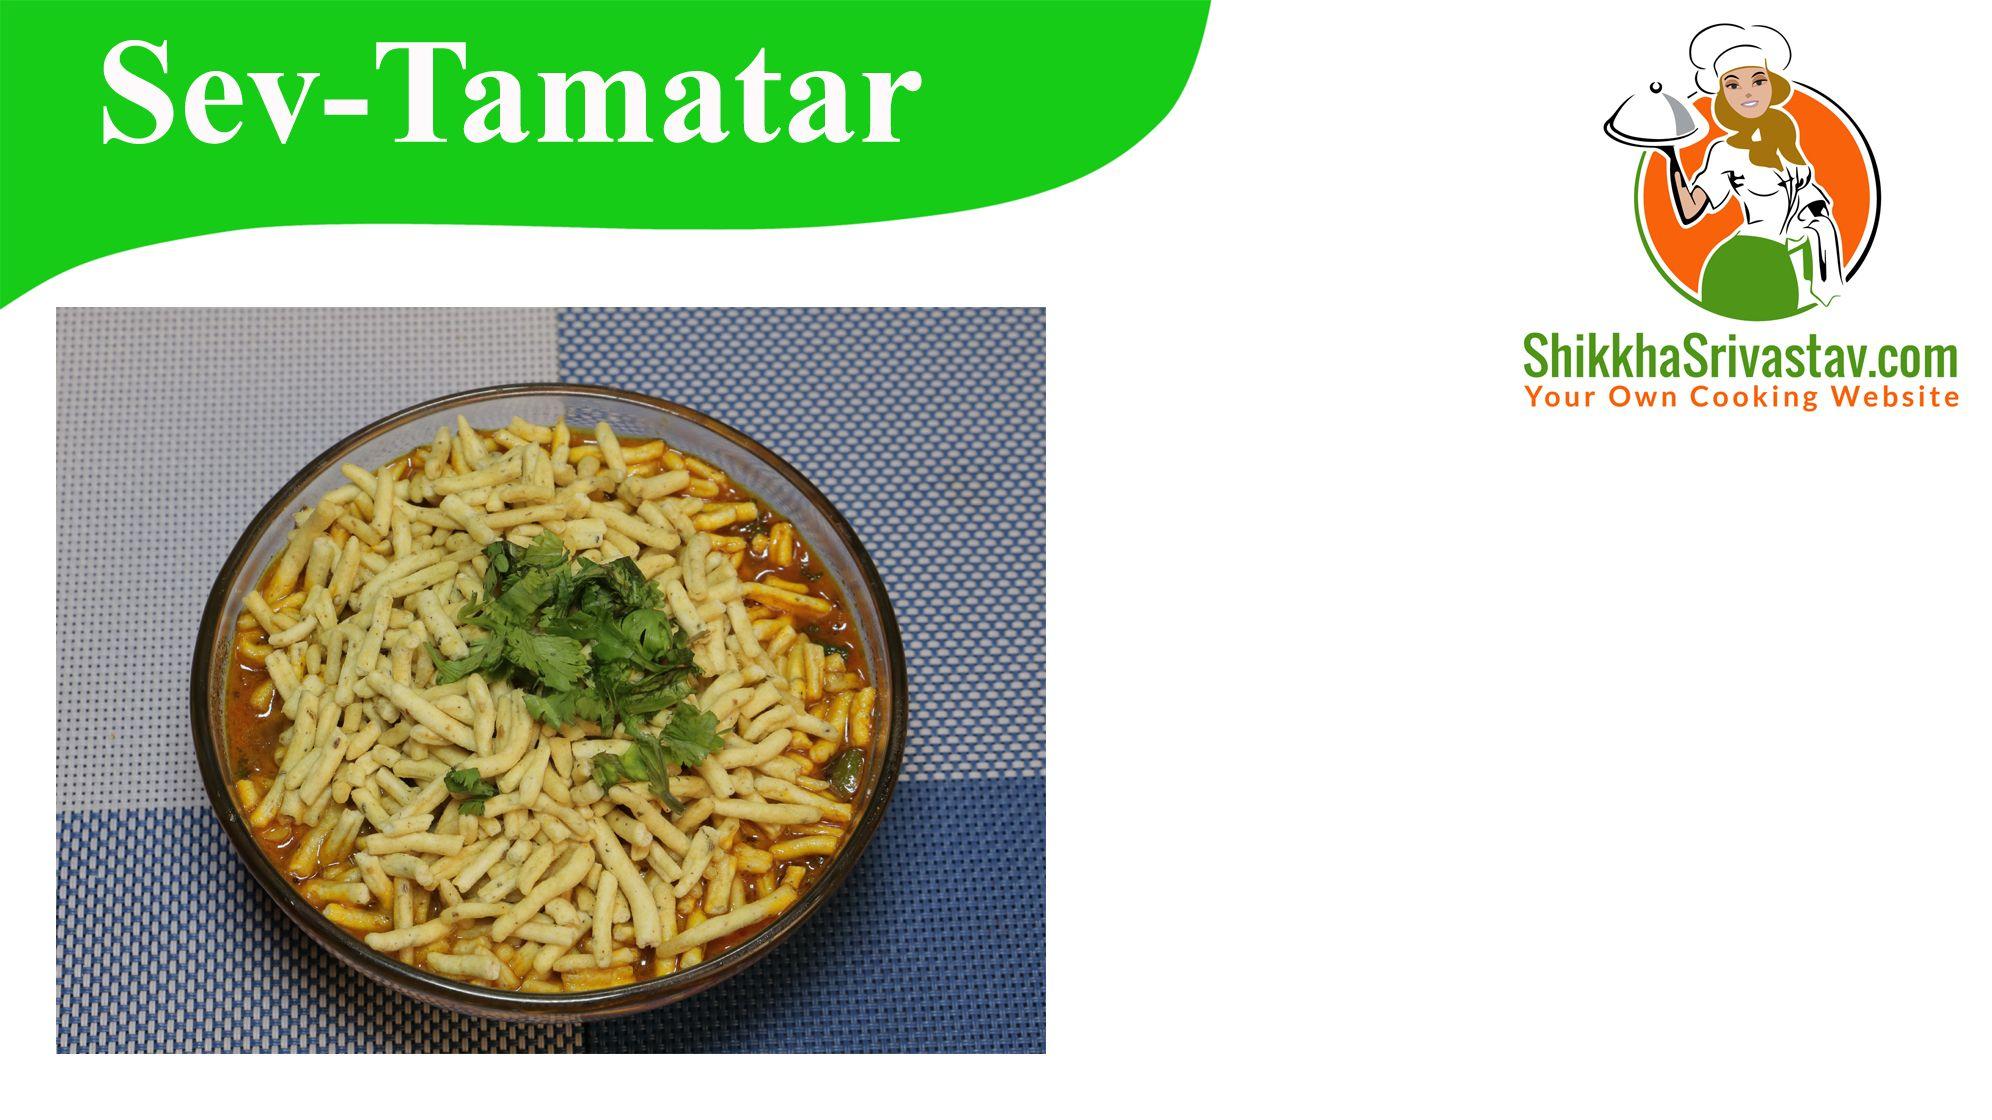 Dhaba style sev tamatar ki sabzi recipe in hindi how to make sev dhaba style sev tamatar ki sabzi recipe in hindi how to make sev tamatar ki sabzi at home in hindi language with step by step preparation forumfinder Images